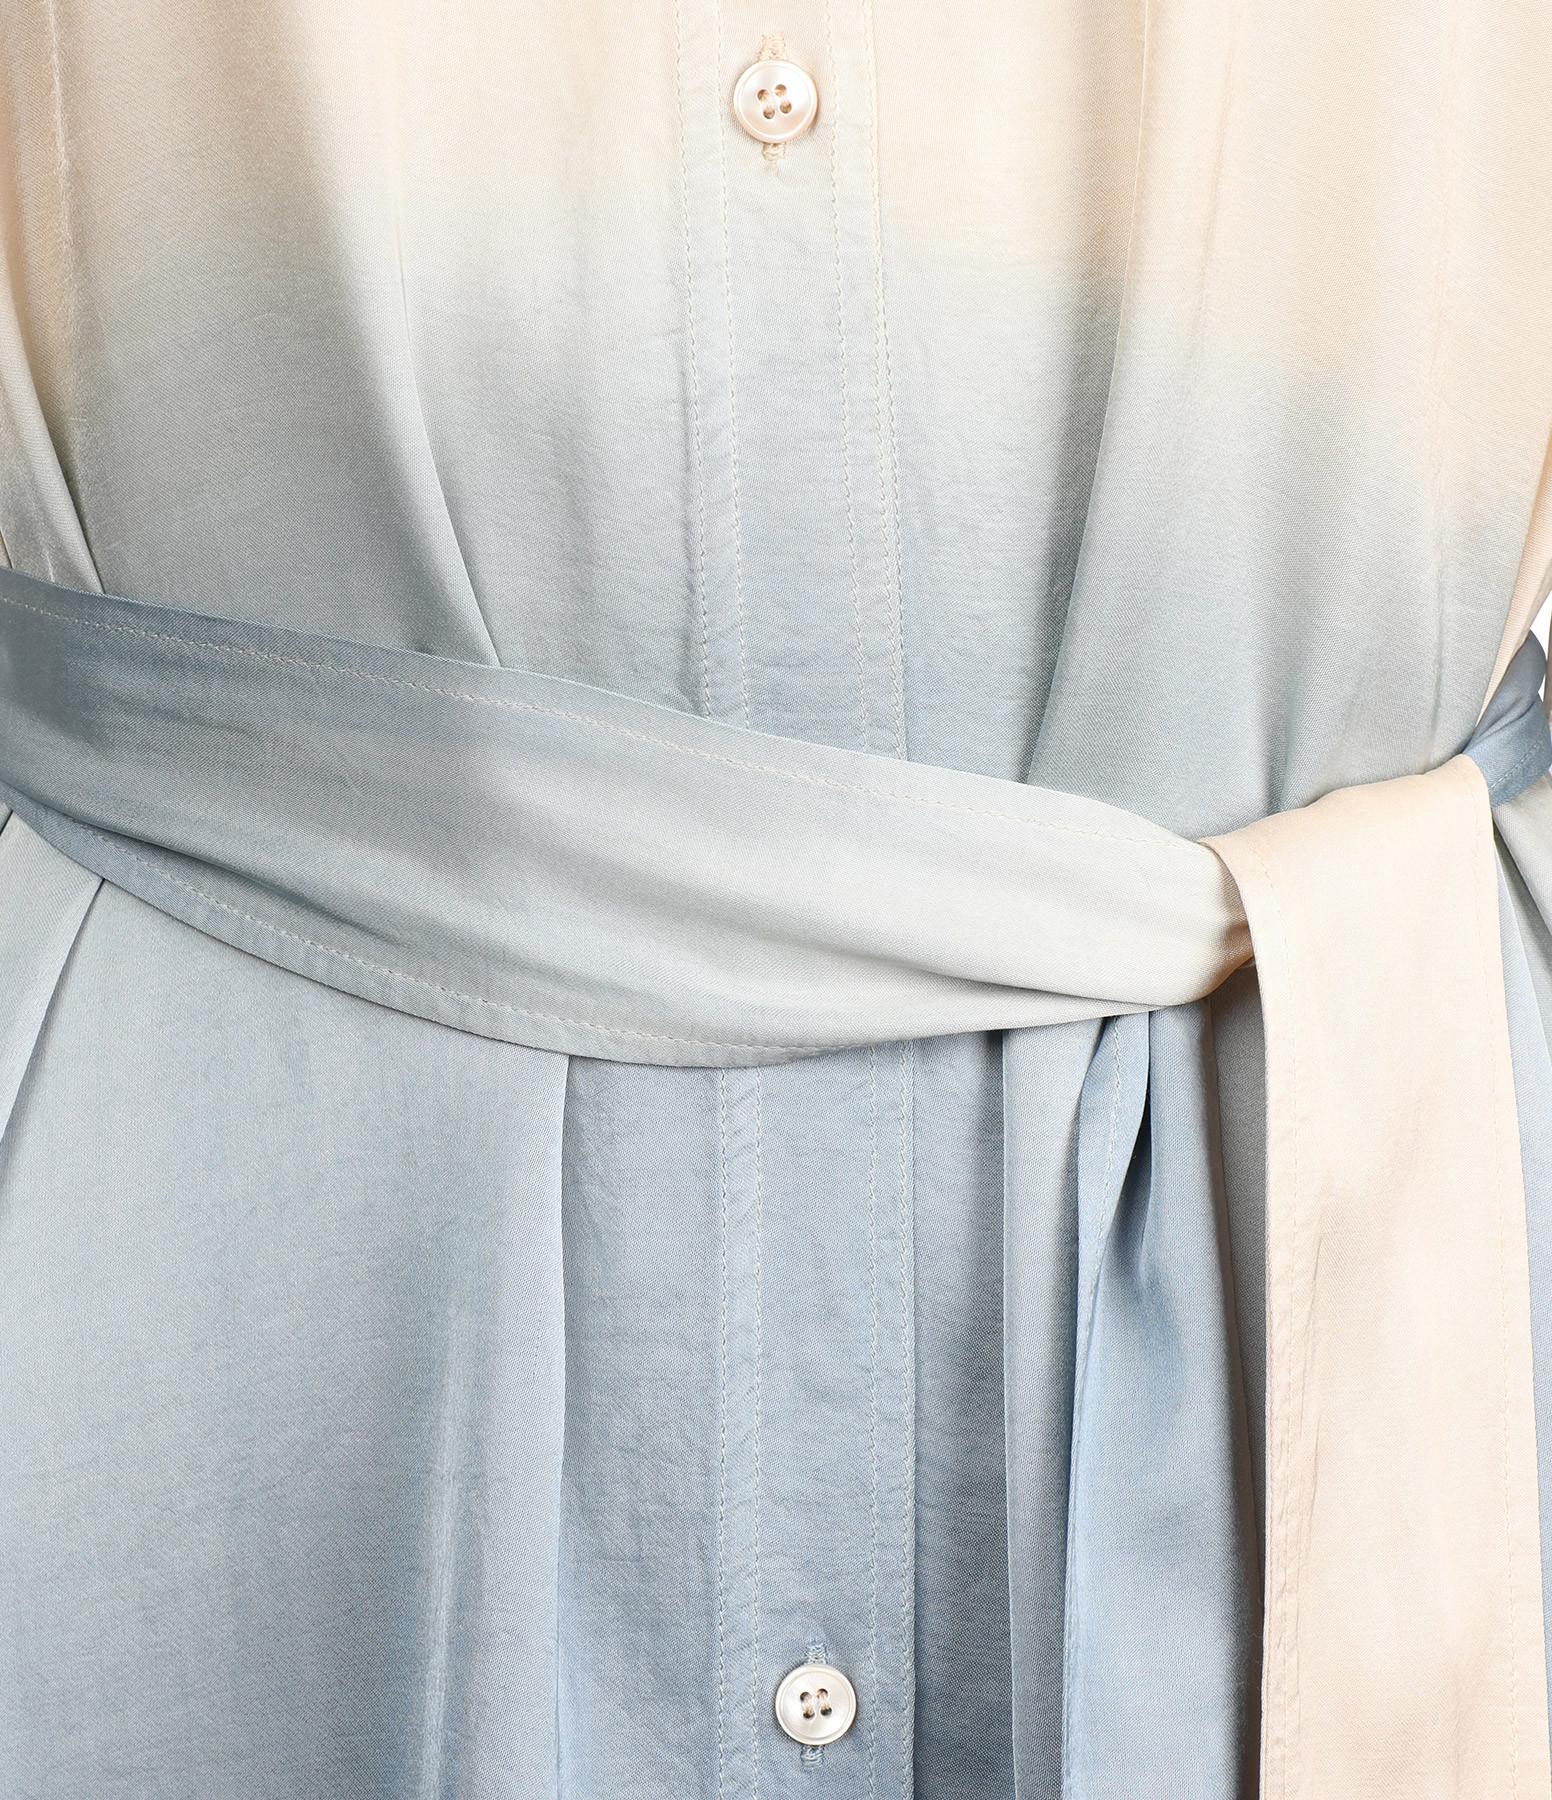 FORTE_FORTE - Robe Chemise Ceinture Satin Indigo